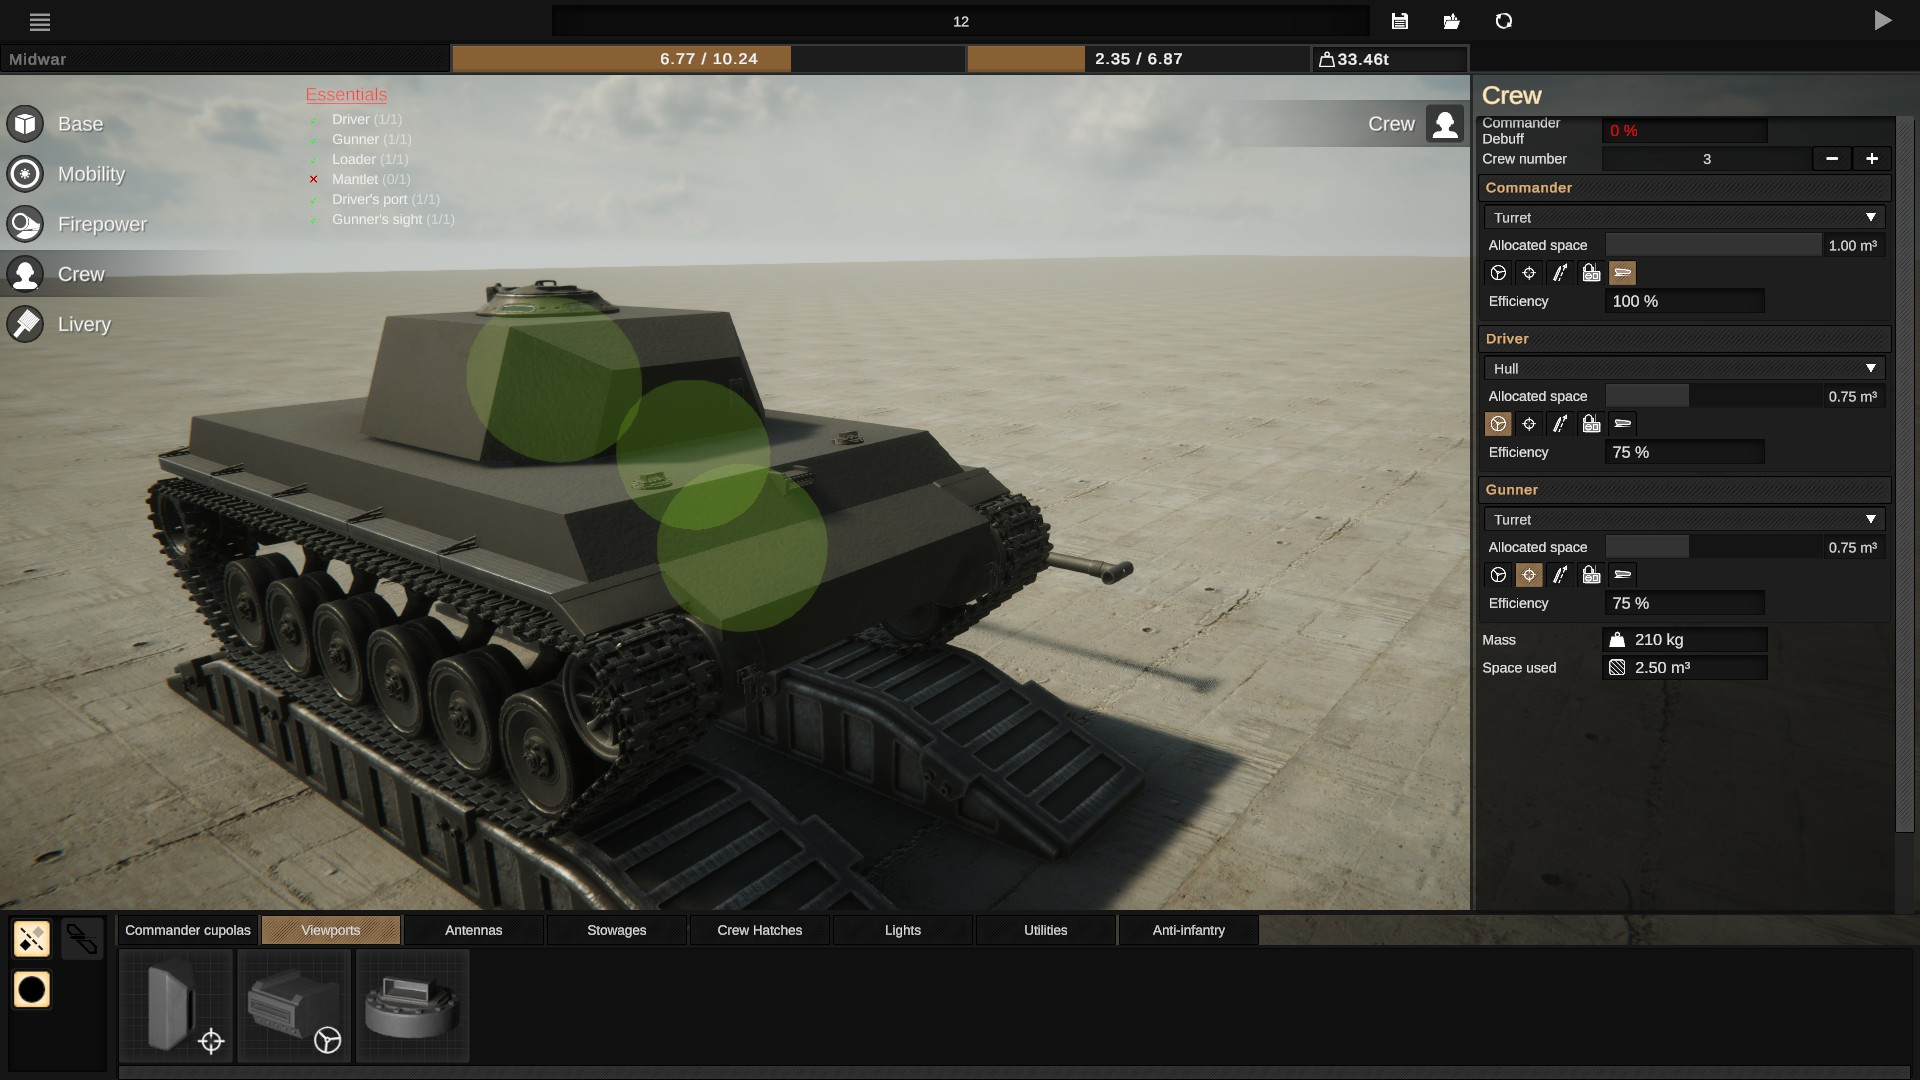 Sprocket - Basic Troubleshooting Steps + Tank Mobility - Crew - 277CA87